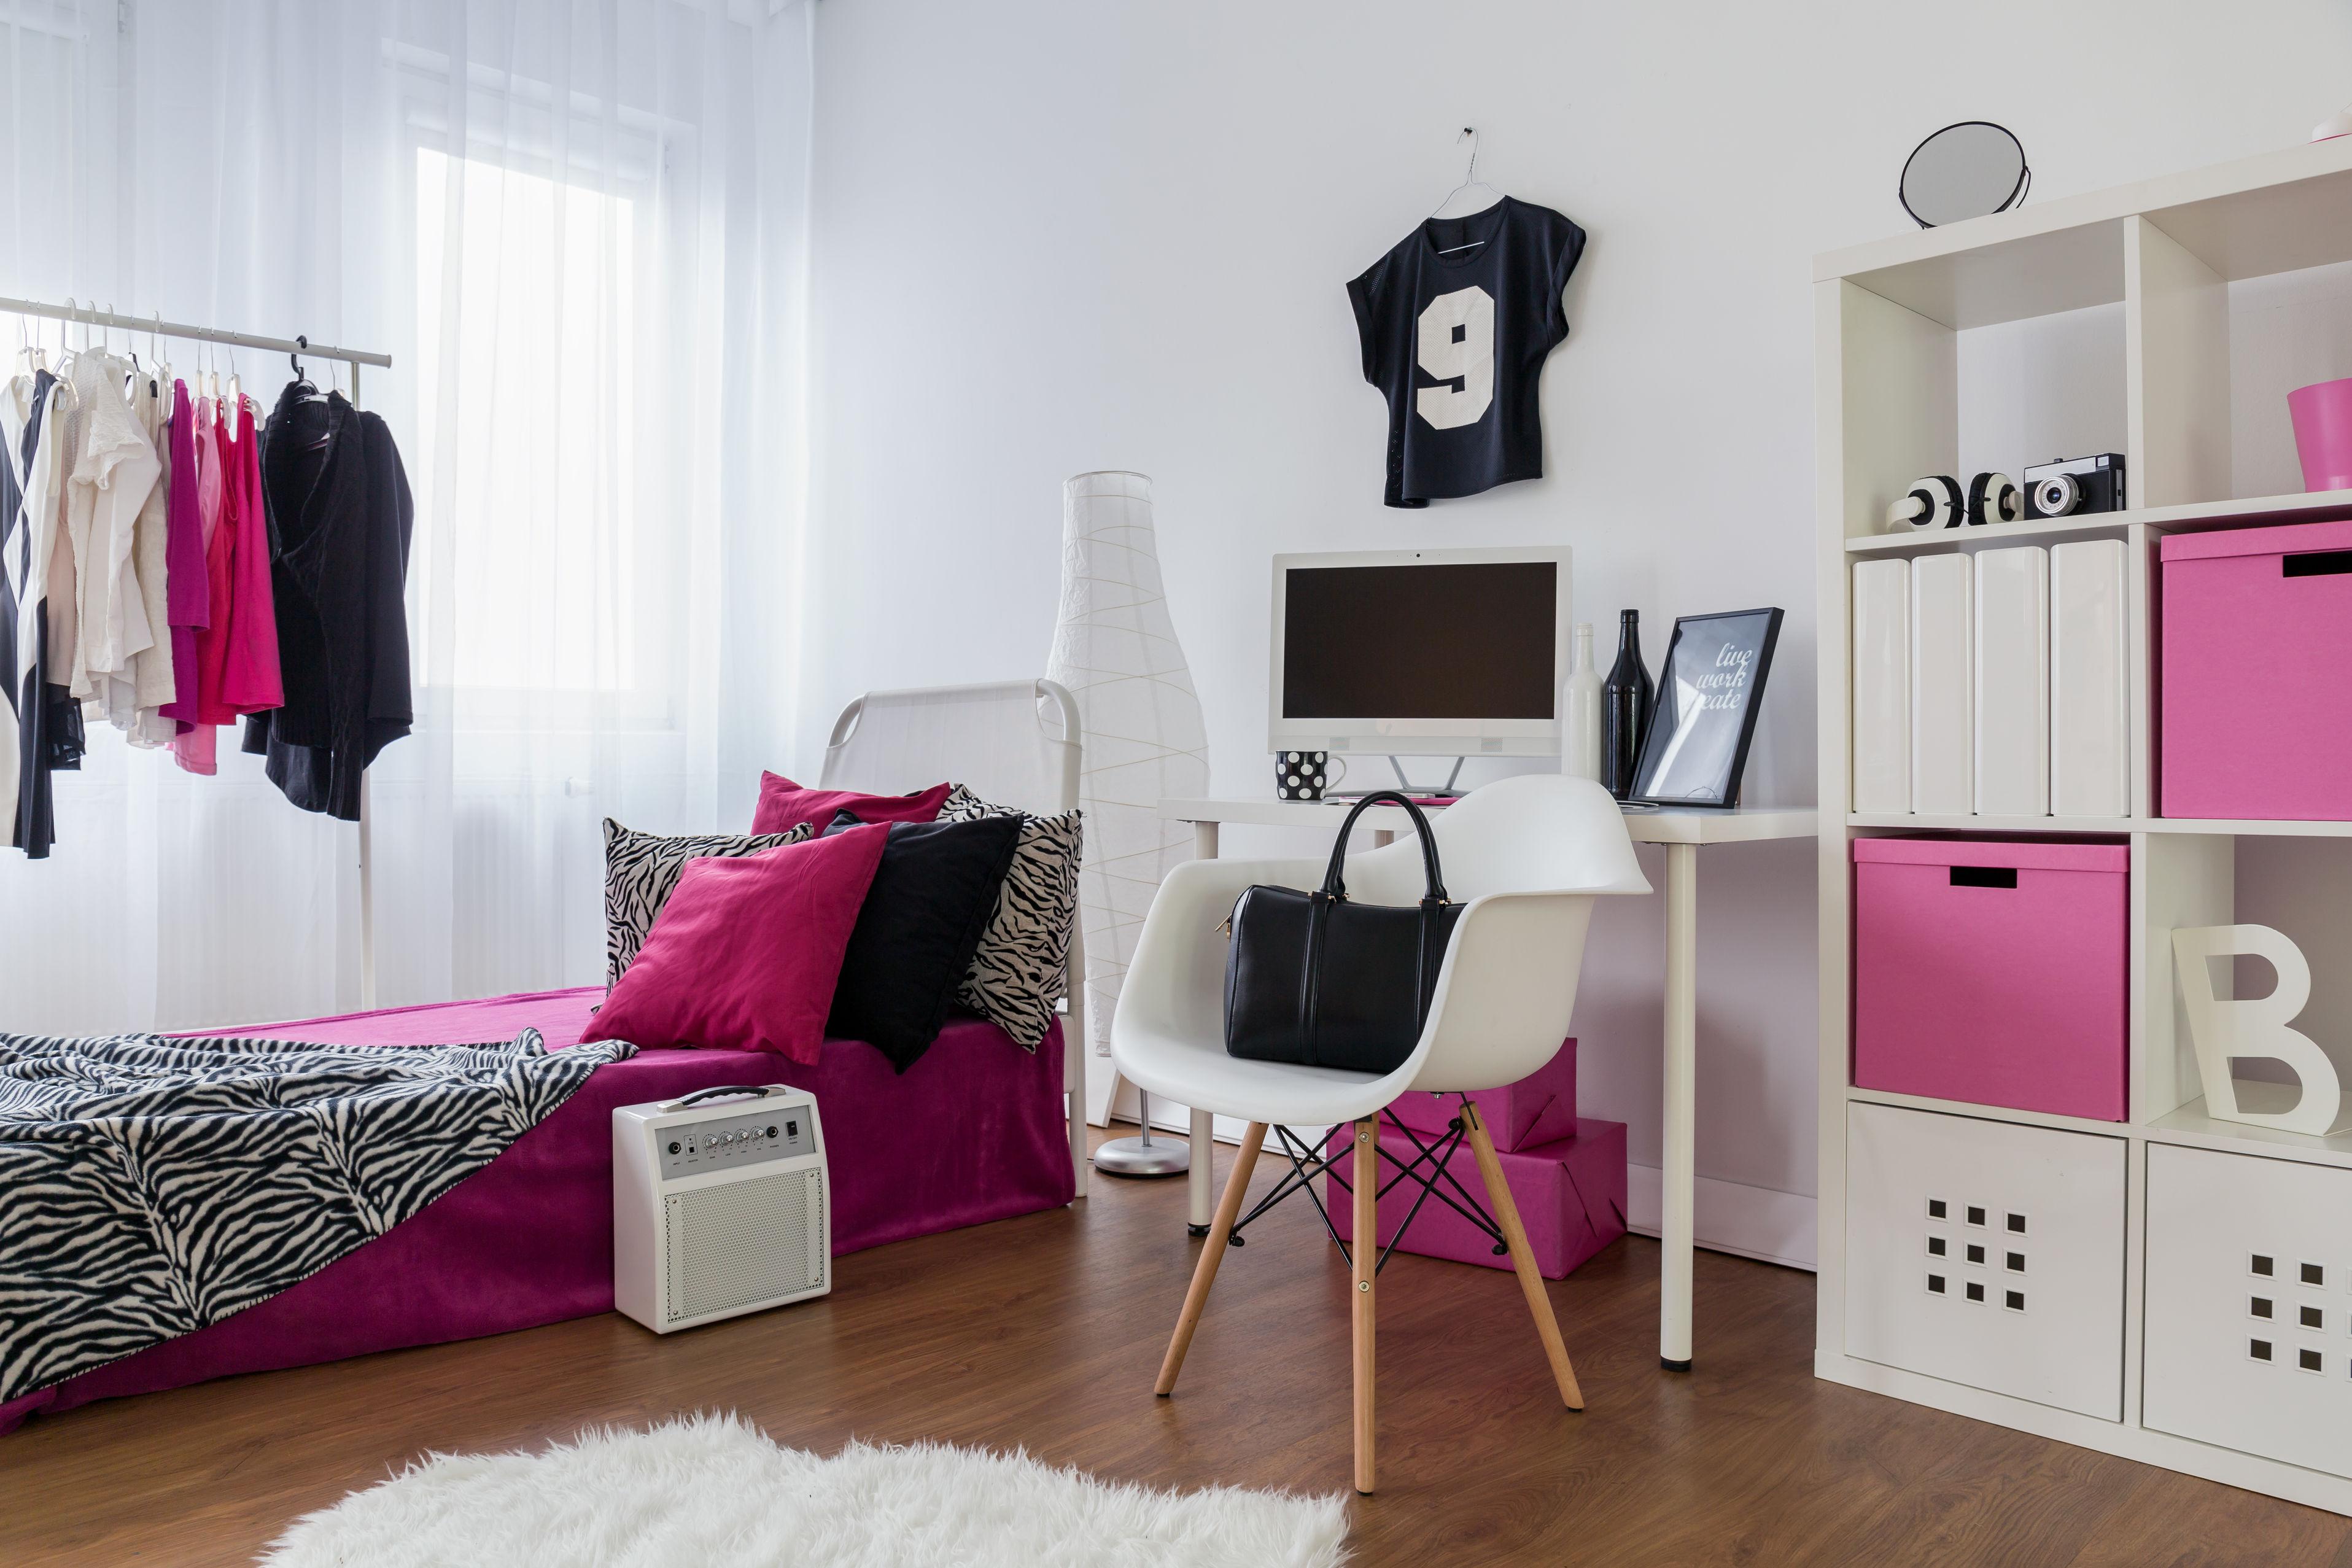 comment amenager une chambre d 39 ado le mag visiondeco. Black Bedroom Furniture Sets. Home Design Ideas